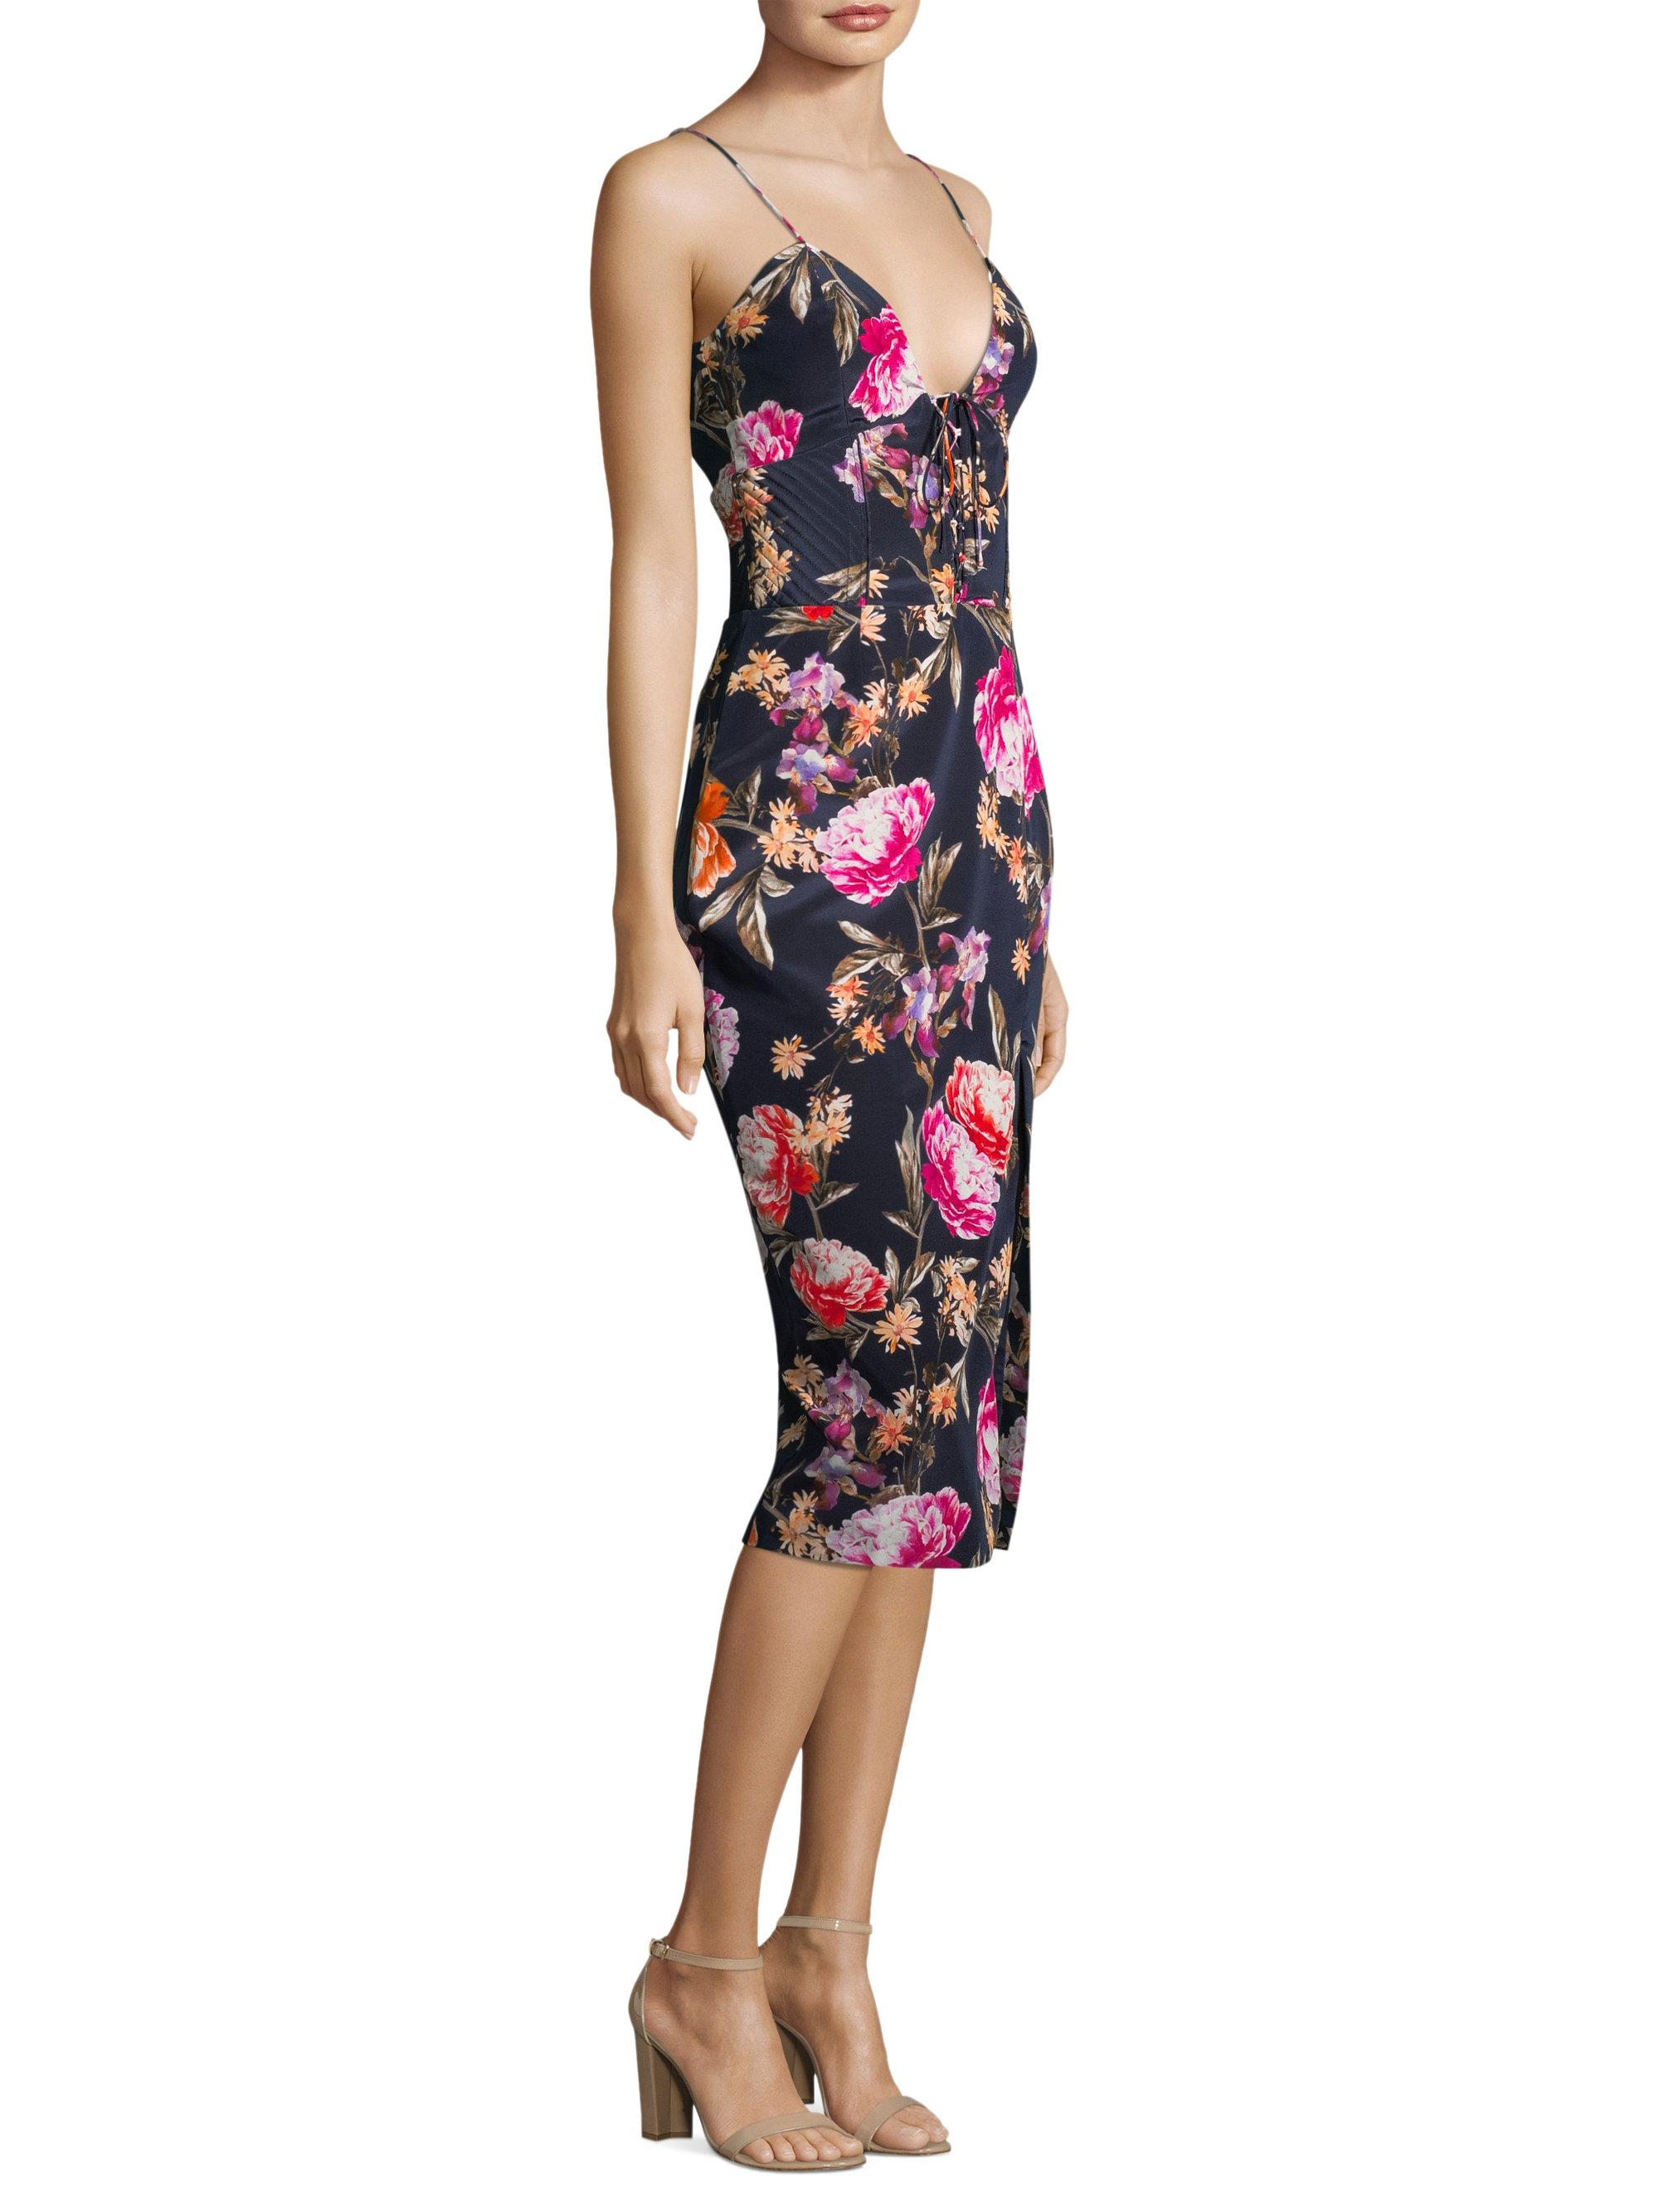 594c478a91 ... Lucile Silk Floral Dress - Lyst. View fullscreen